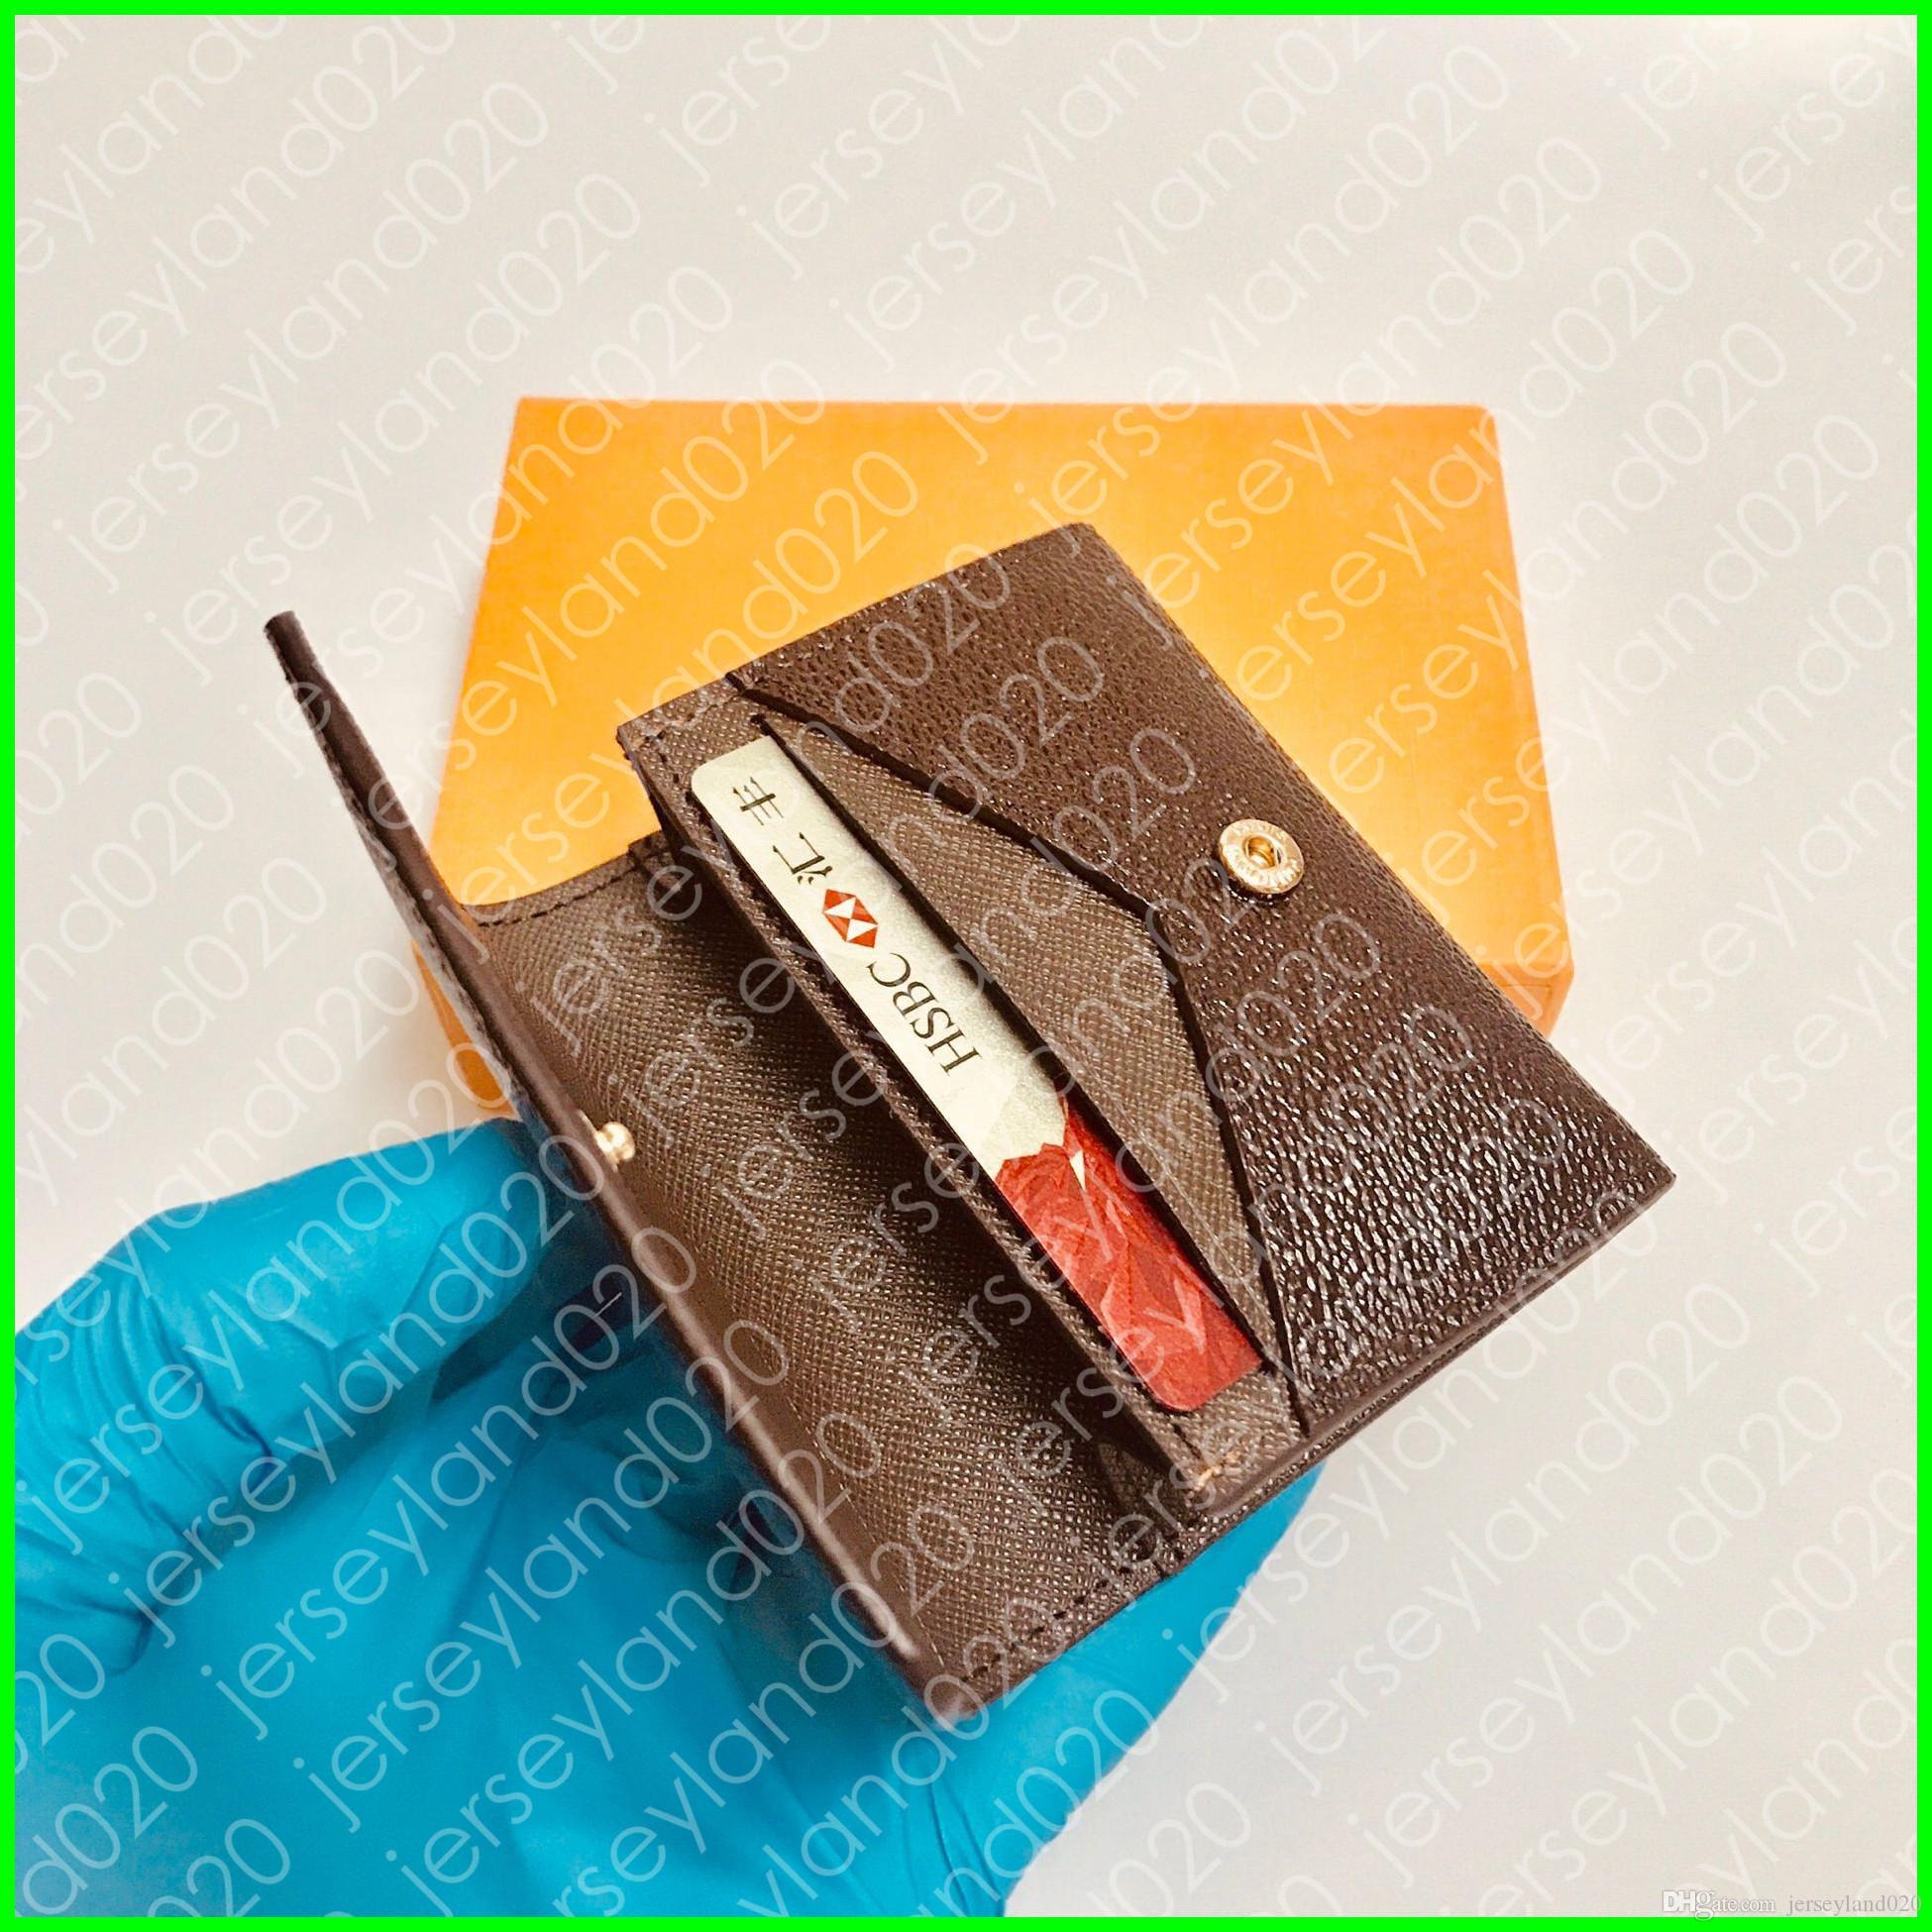 enveloppe carte de visite n63338 مصمم أزياء الرجال عملة التجارية بطاقة الائتمان تذكرة حامل مفتاح حالة الفاخرة الجيب المنظم محفظة M63801